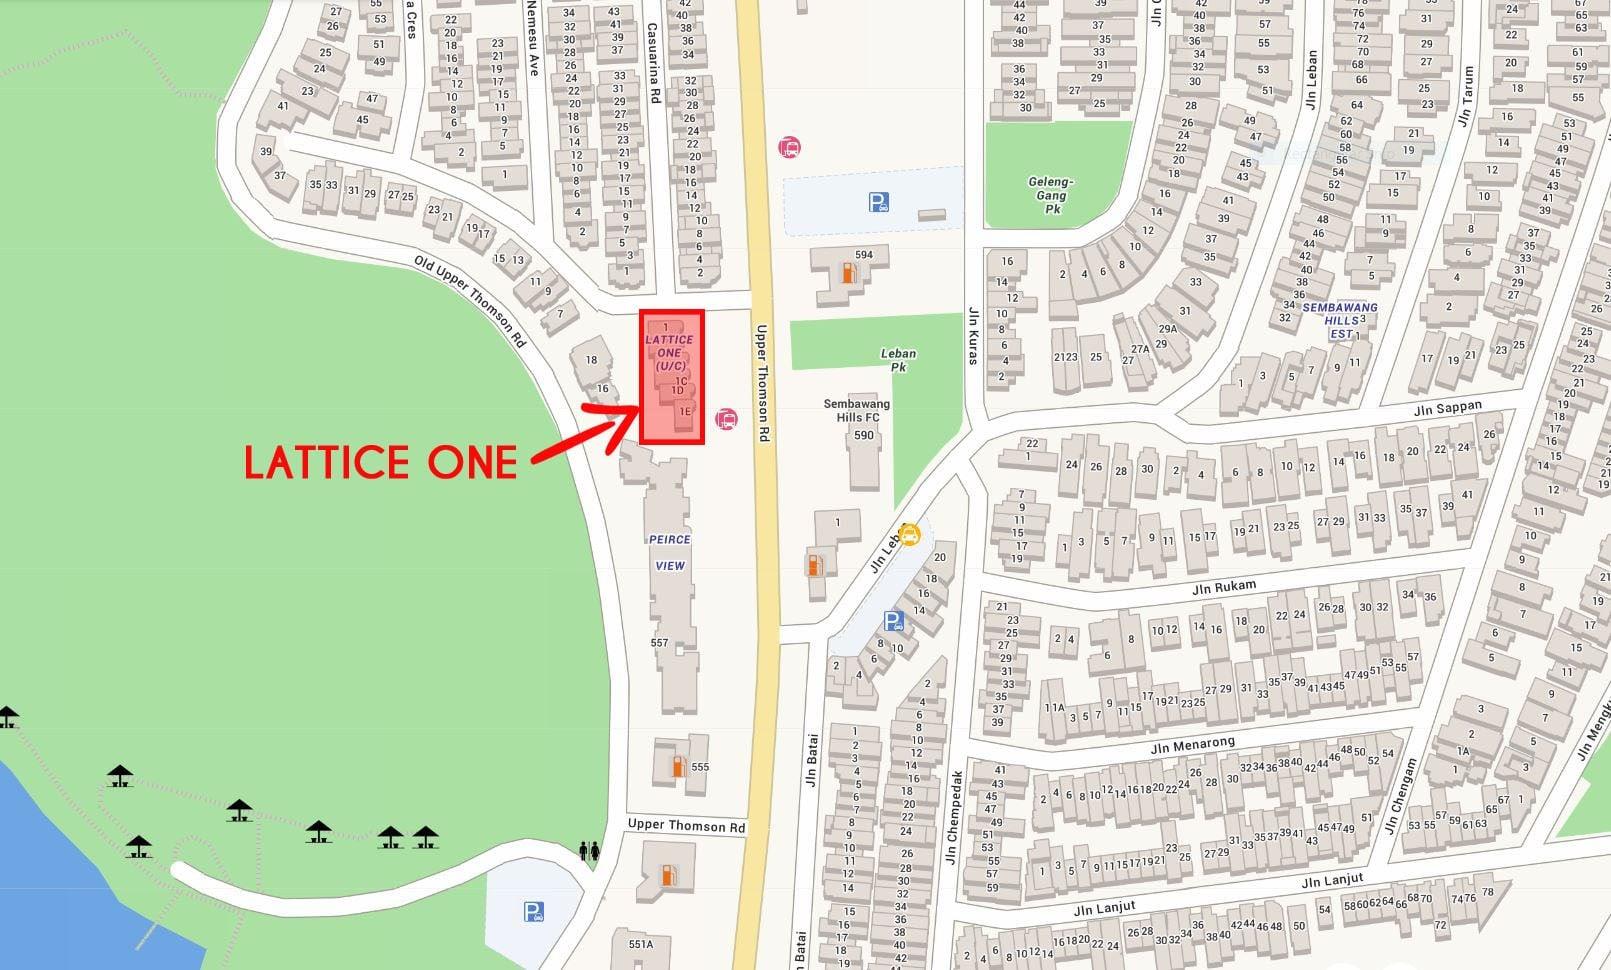 Lattice-One-location-map